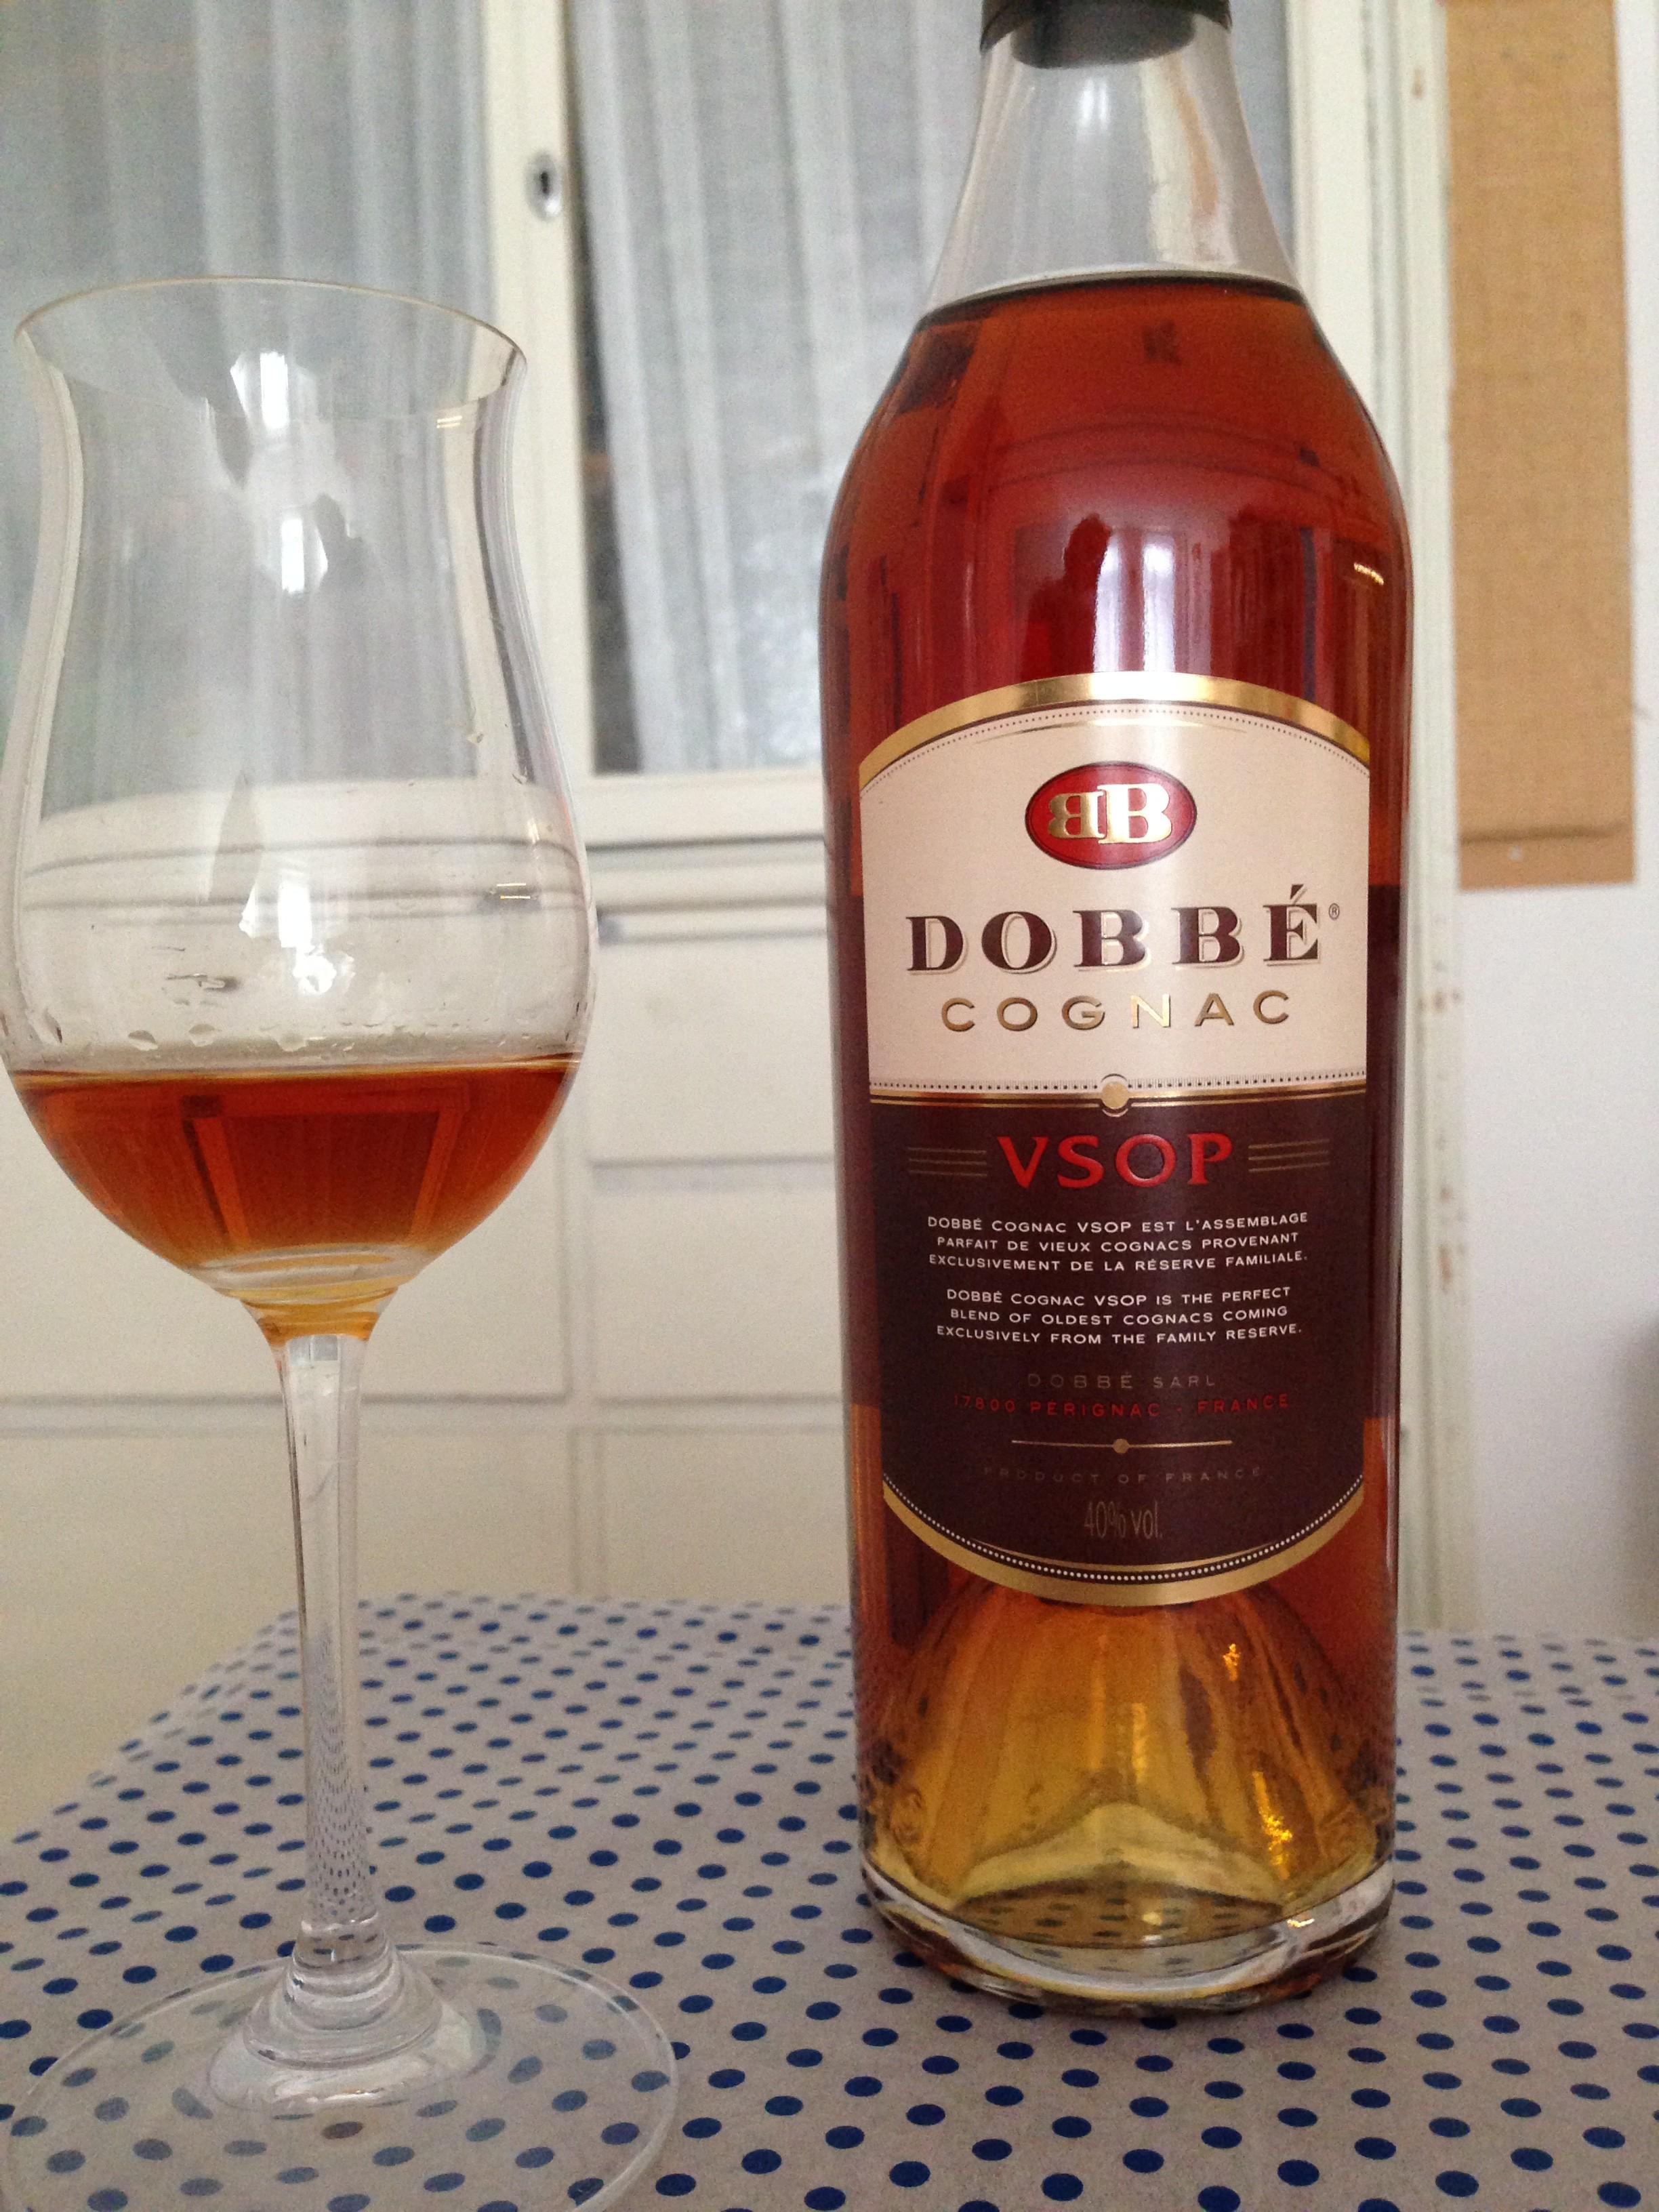 Dobbe Cognac VSOP